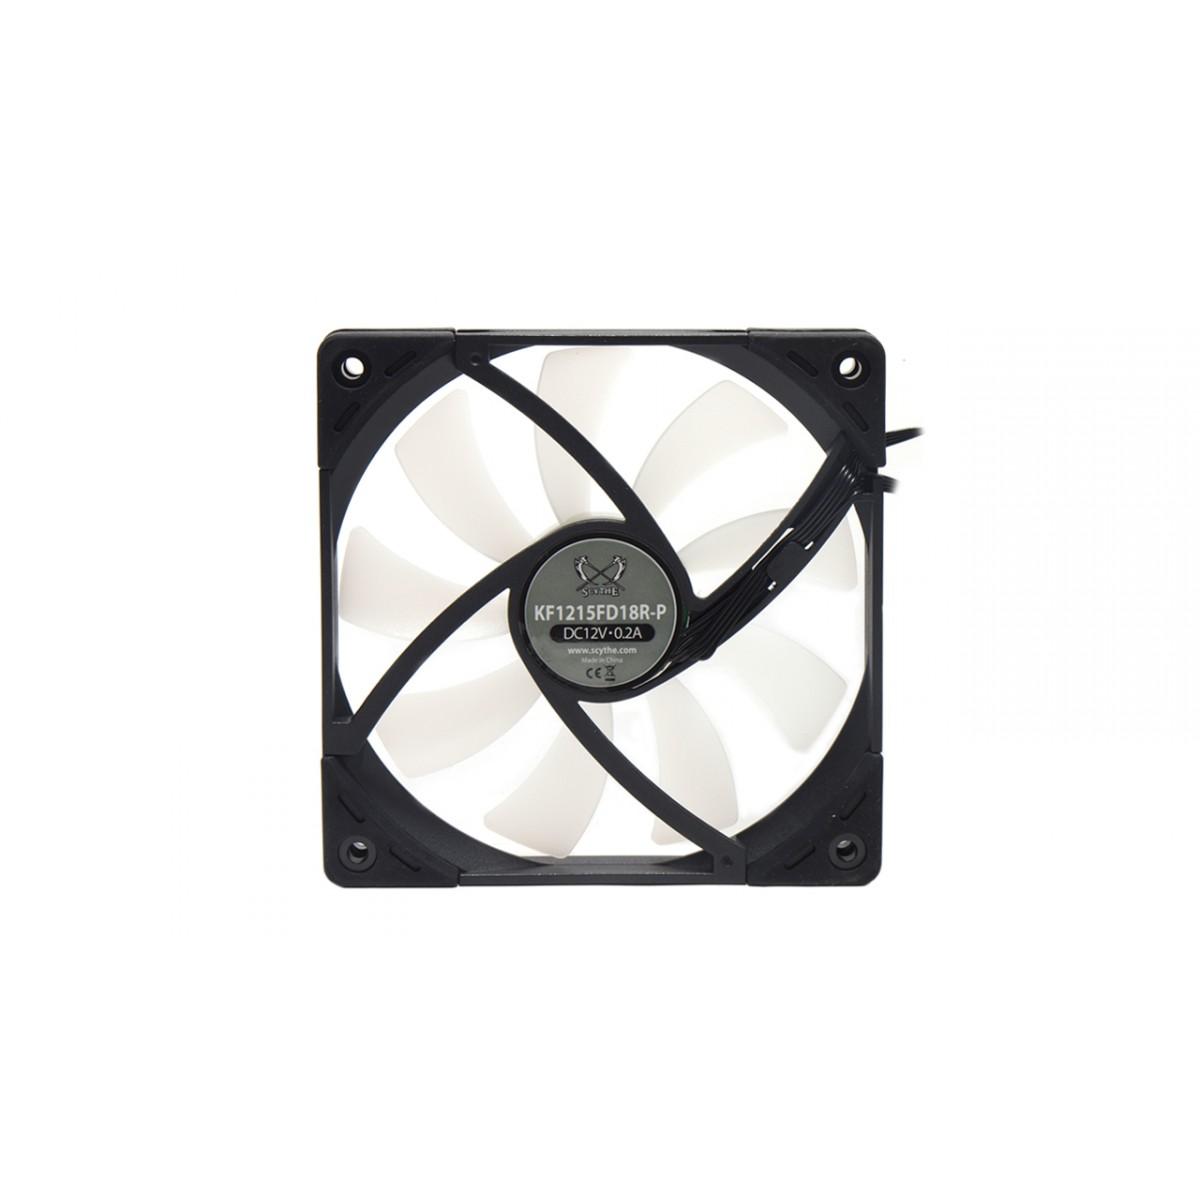 Cooler para Gabinete Scythe Kaze Flex 120mm Slim RGB PWM, KF1215FD18R-P